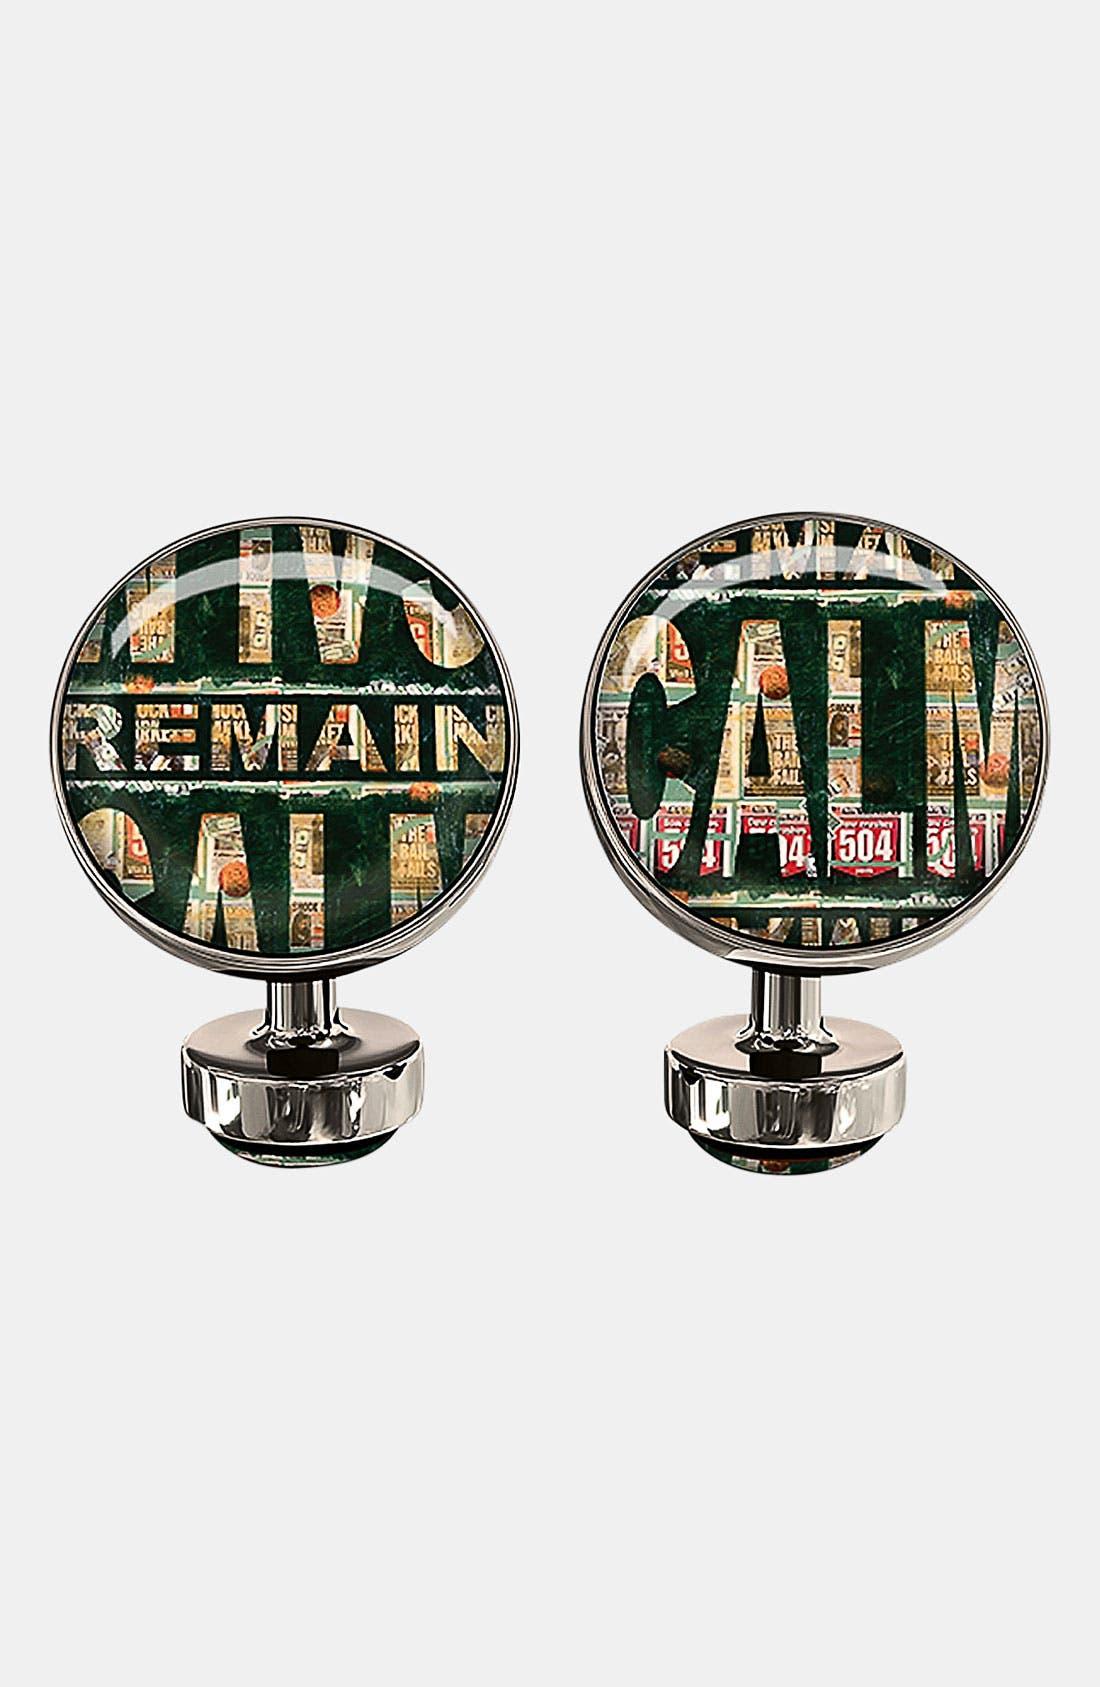 Alternate Image 1 Selected - Würkin Stiffs 'Remain Calm' Round Cuff Links